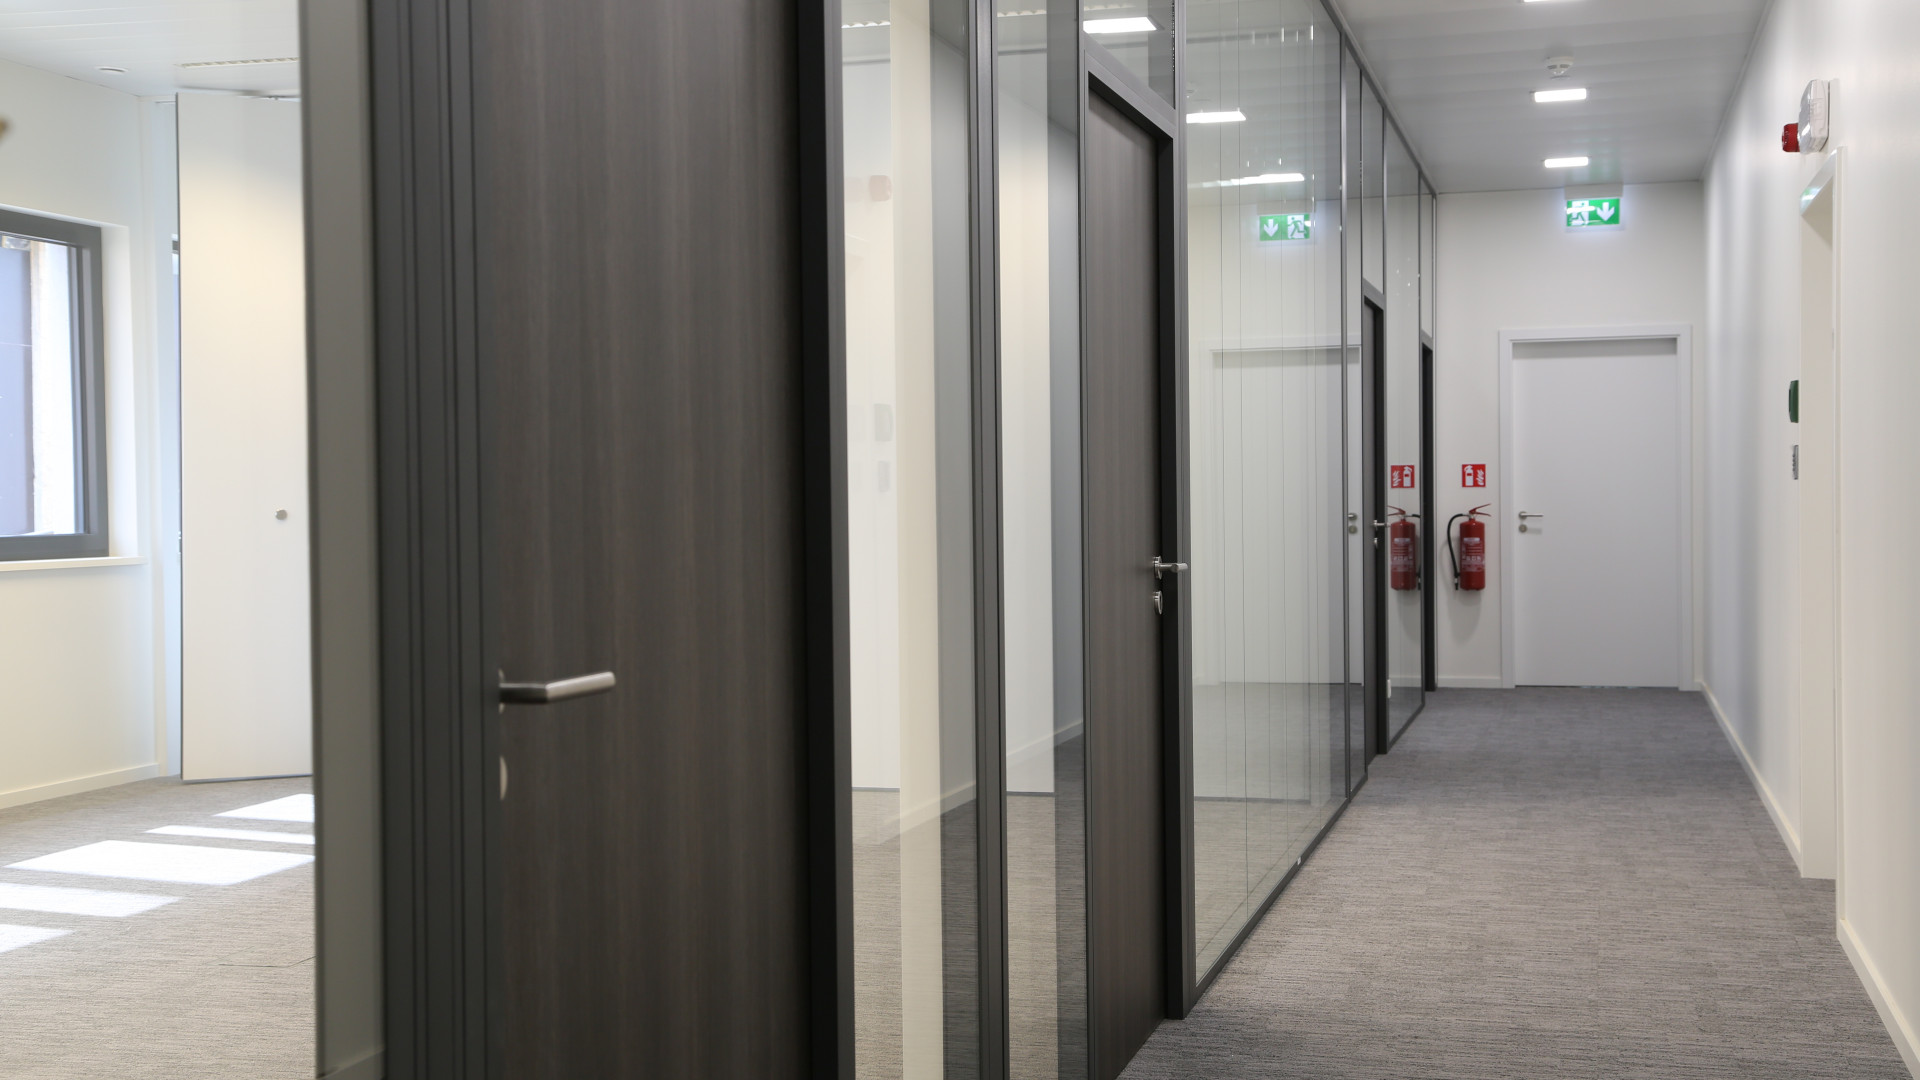 https://www.bamolux.lu/media/cover_large/417-8-porte-interieure-bureau-menuiserie-interieure-realisation-bamolux-showroom-luxembourg-howald-foetz.jpeg